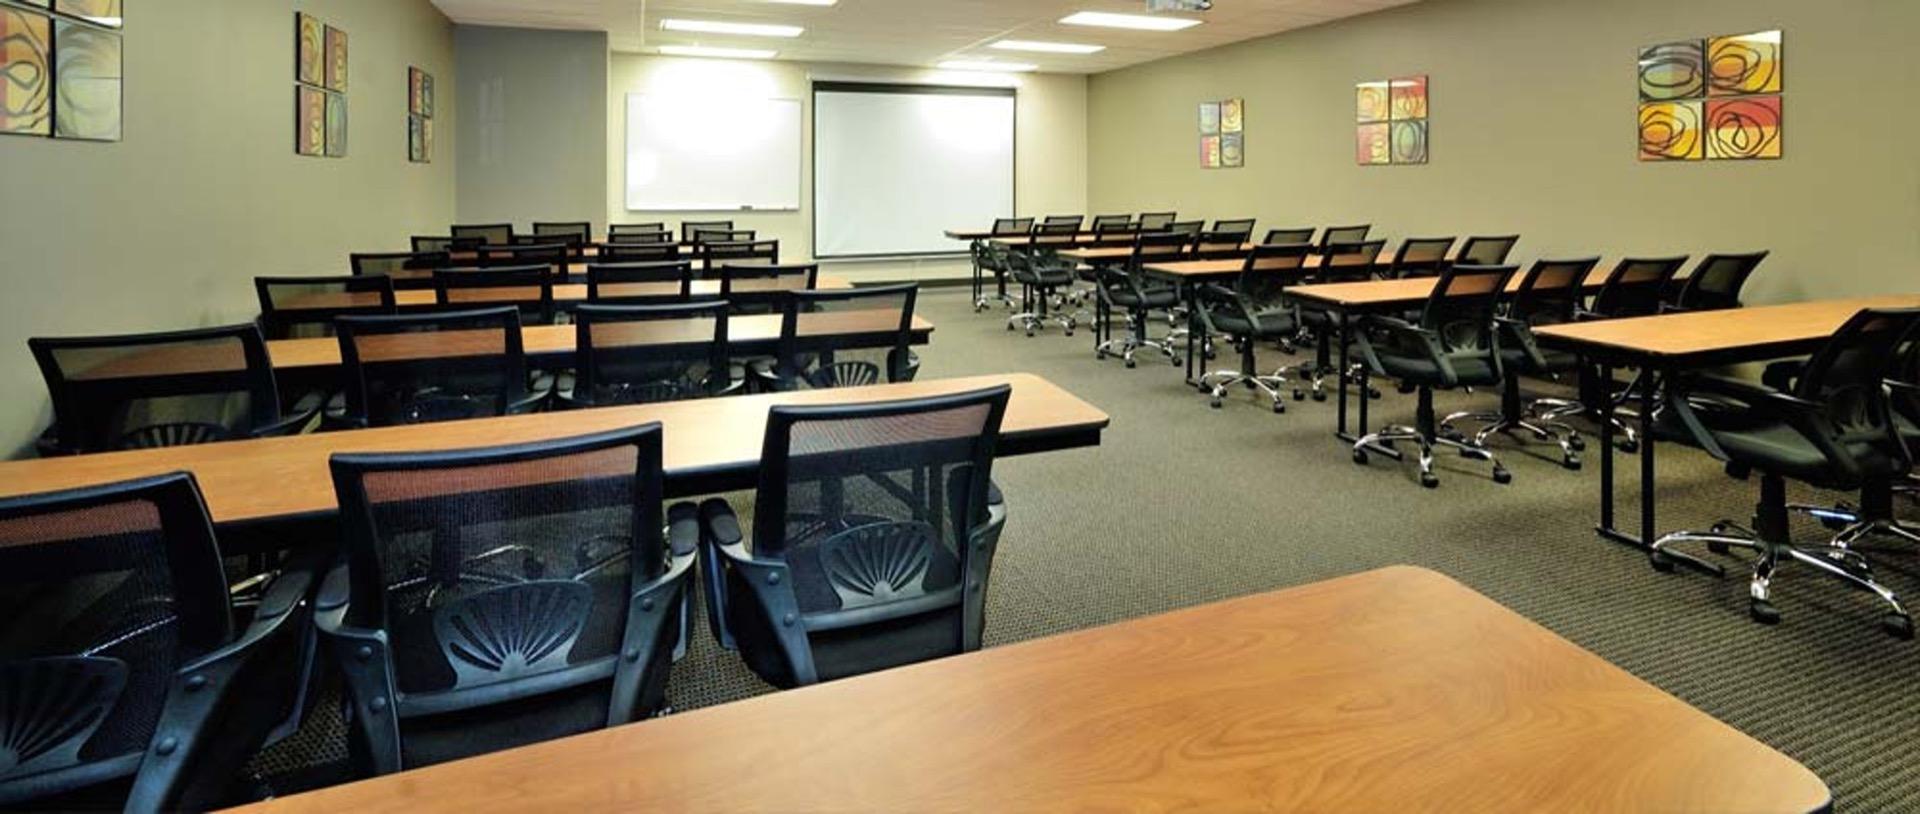 Rent Training Rooms - Seminars, Events, Workshops | Meridian